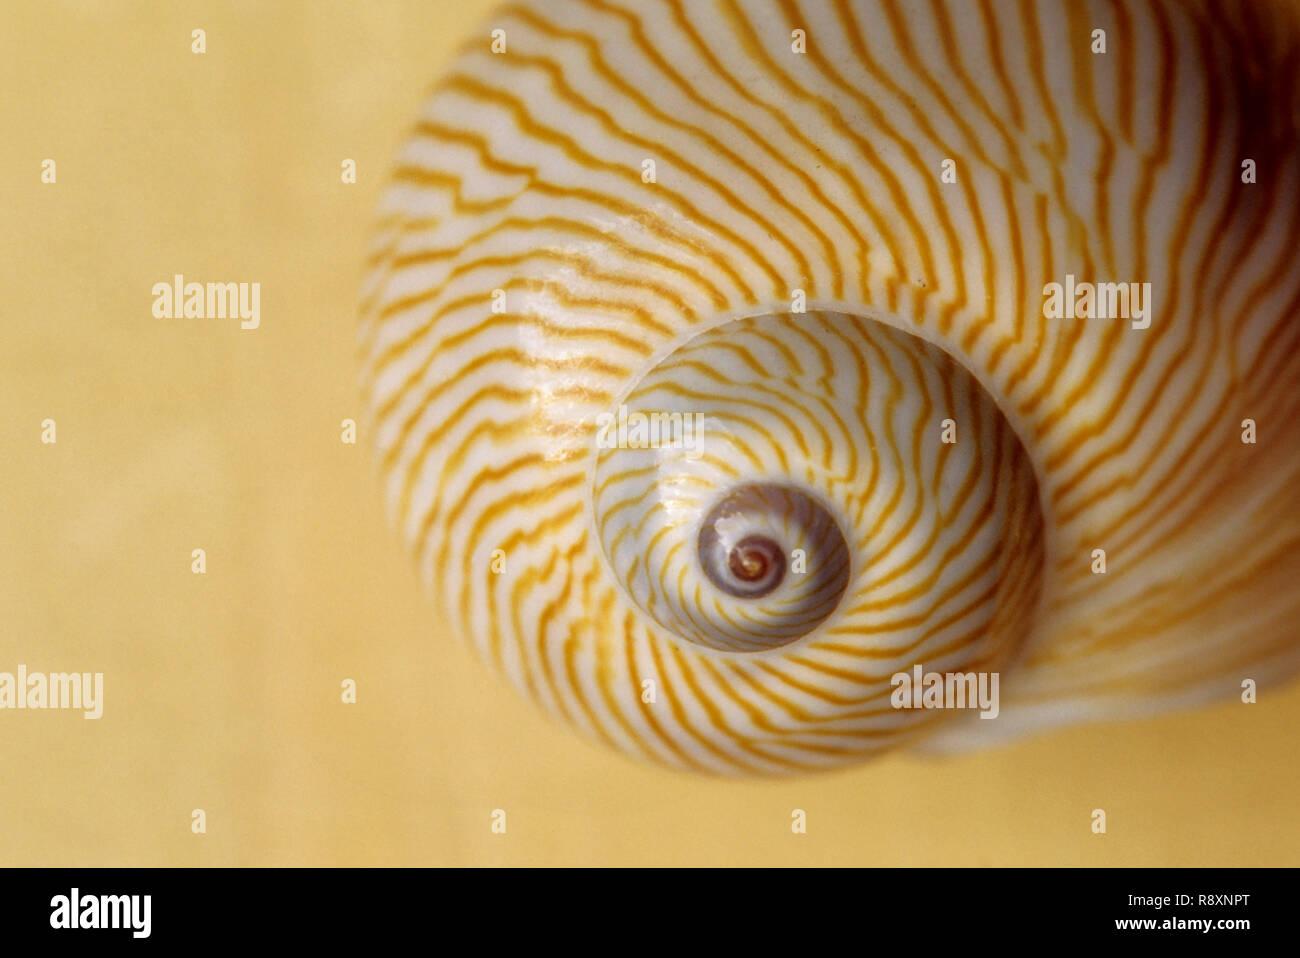 Nahaufnahmen von Shell, Konzept, Indien Stockbild